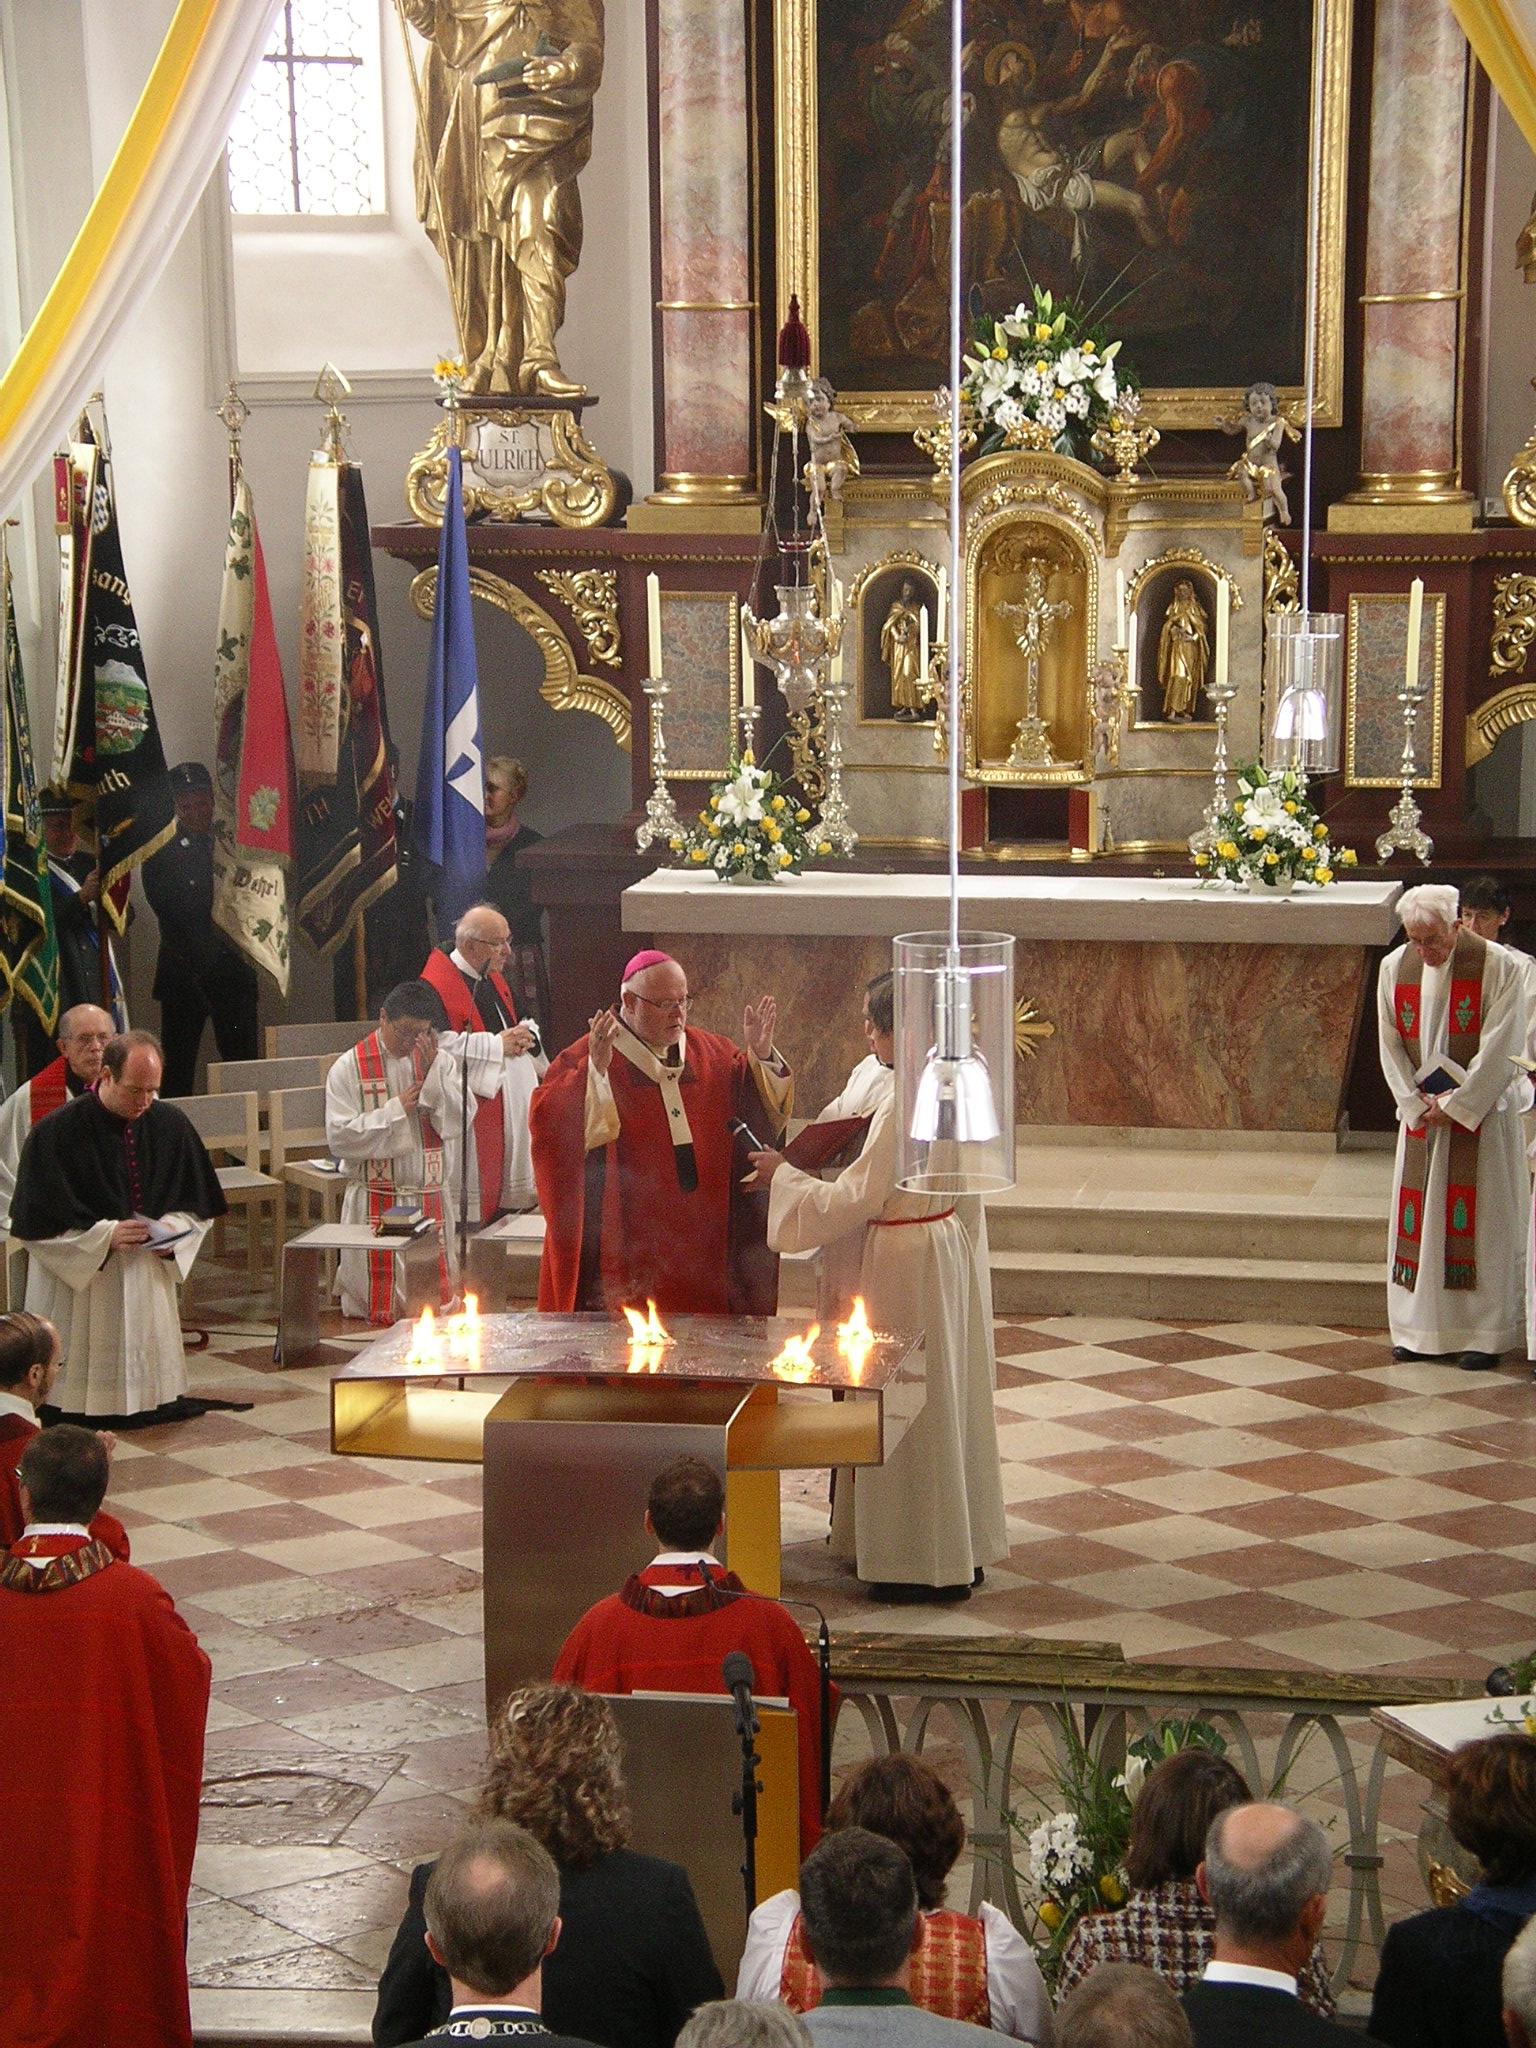 Pfarrkirche St. Emmeram Sakristei